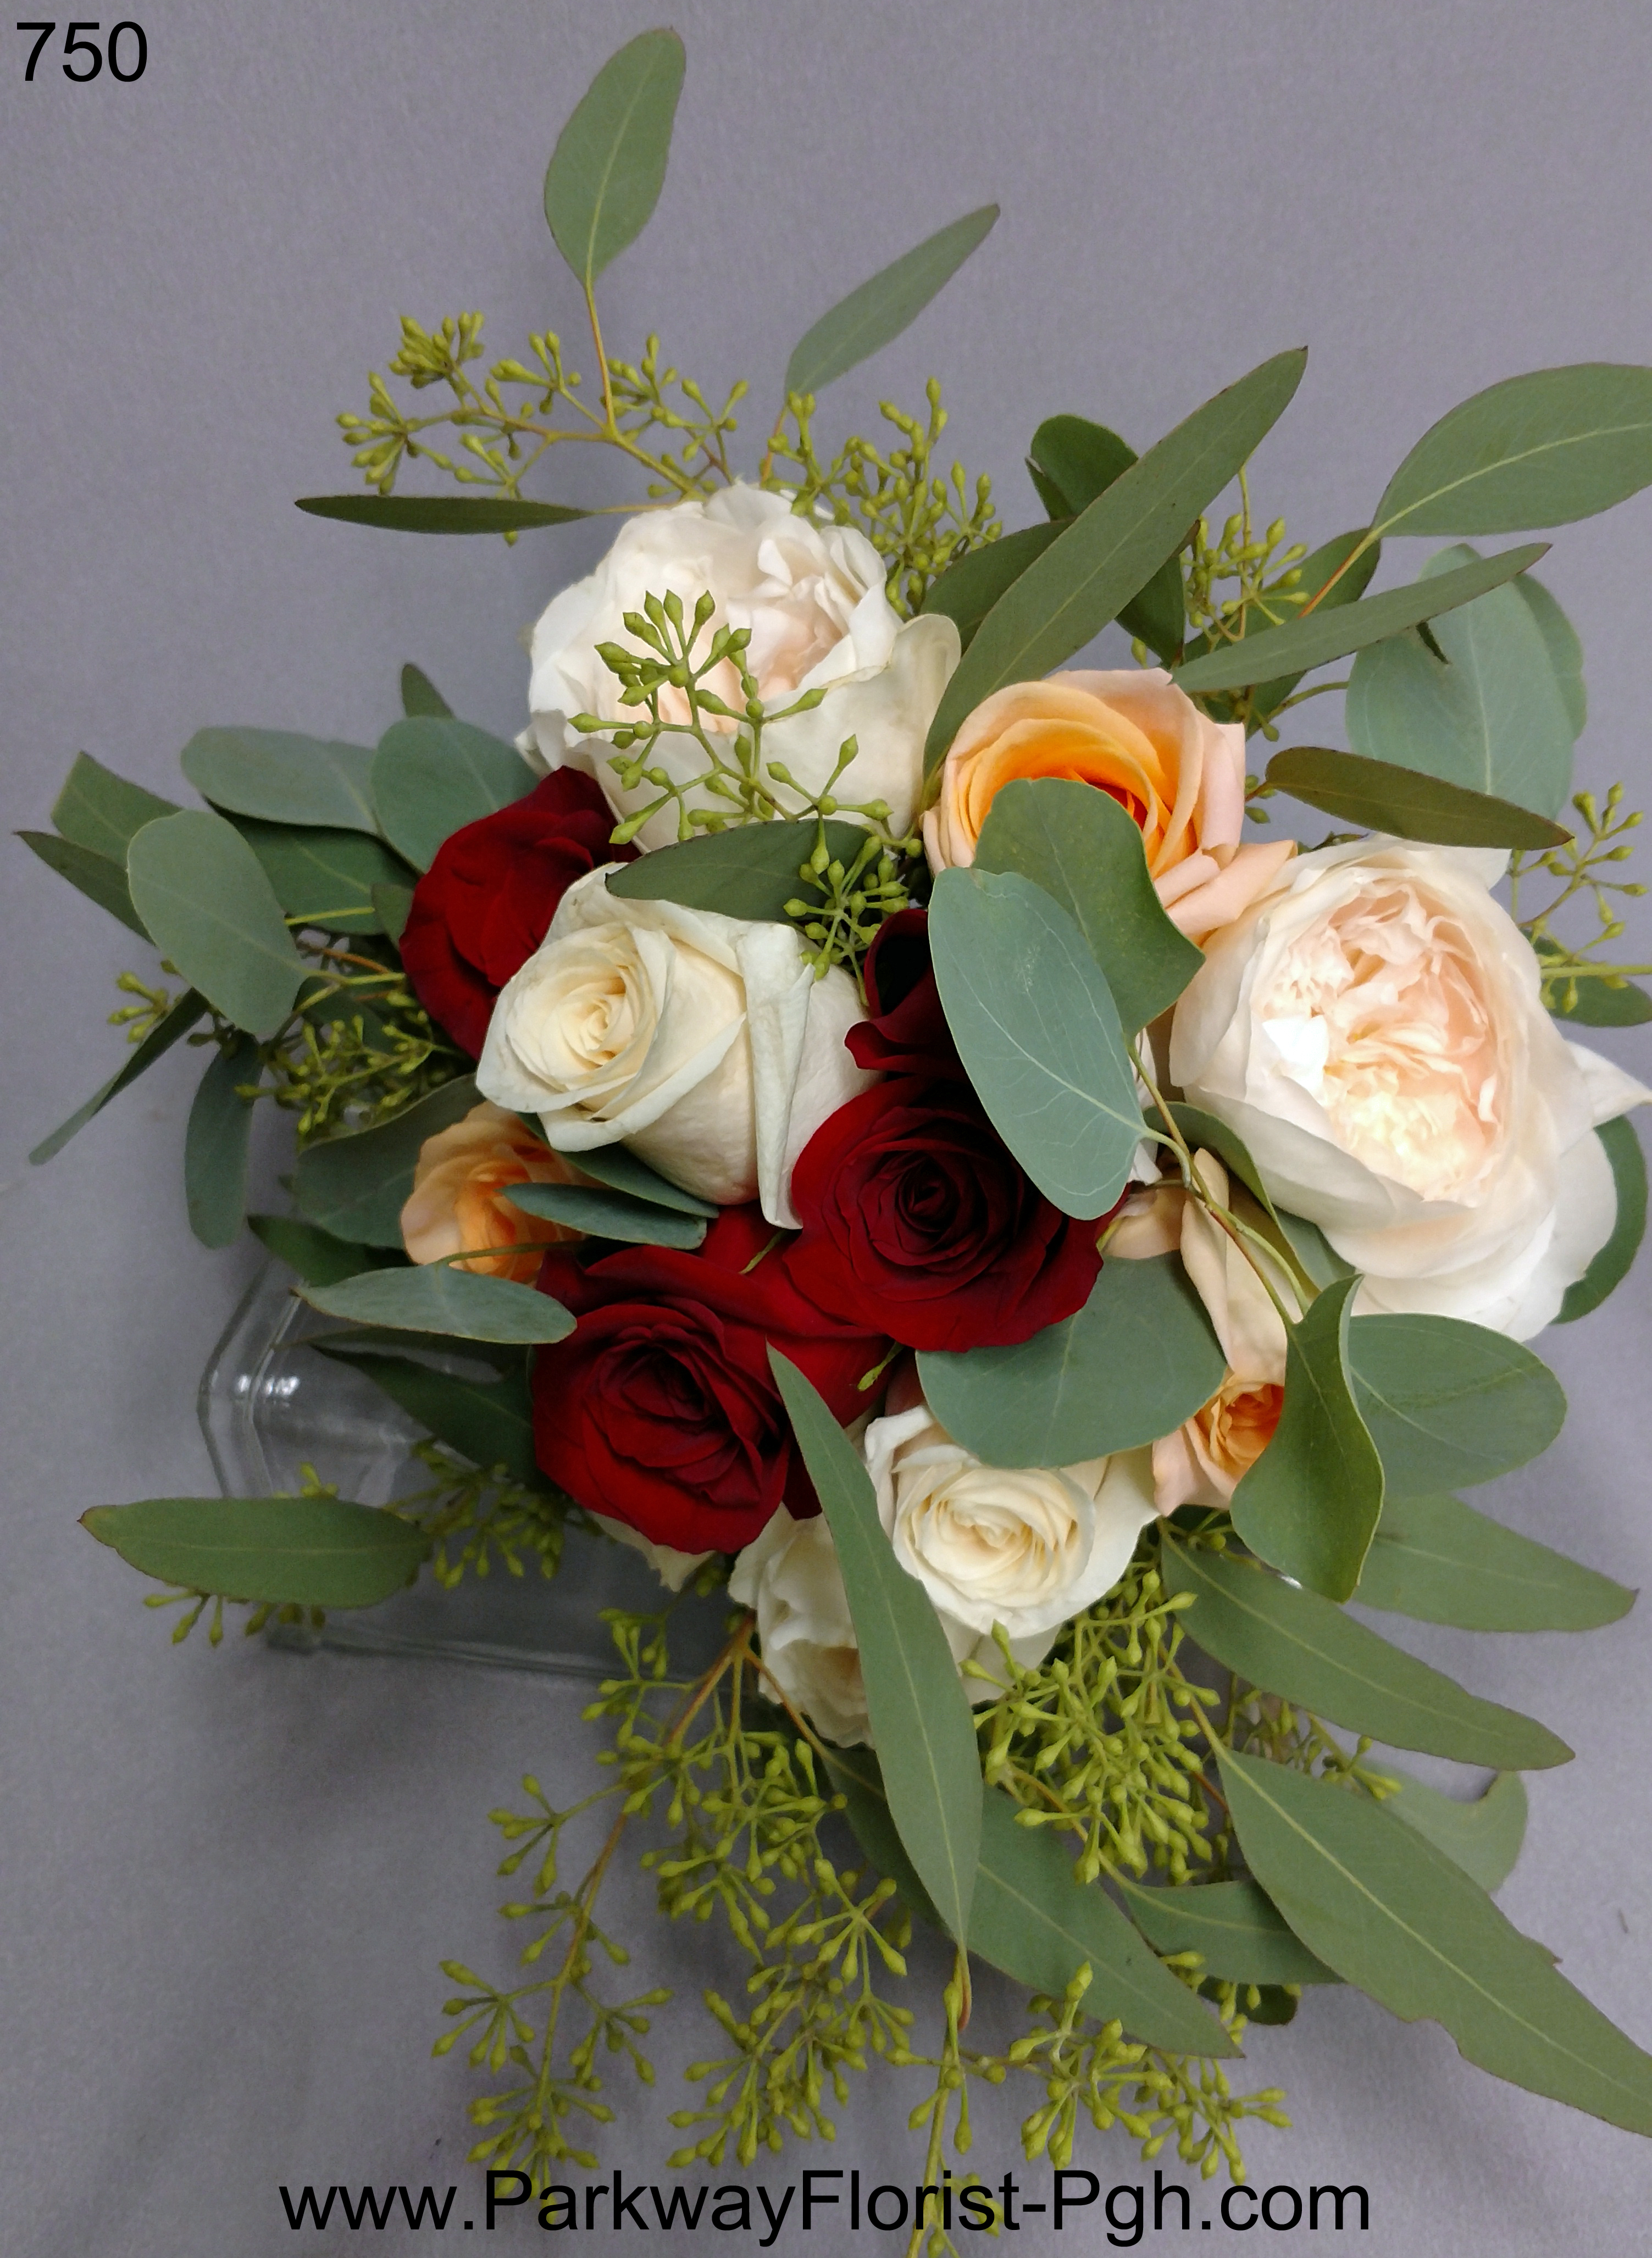 parkway florist pittsburgh blog weddings events everyday flowers. Black Bedroom Furniture Sets. Home Design Ideas